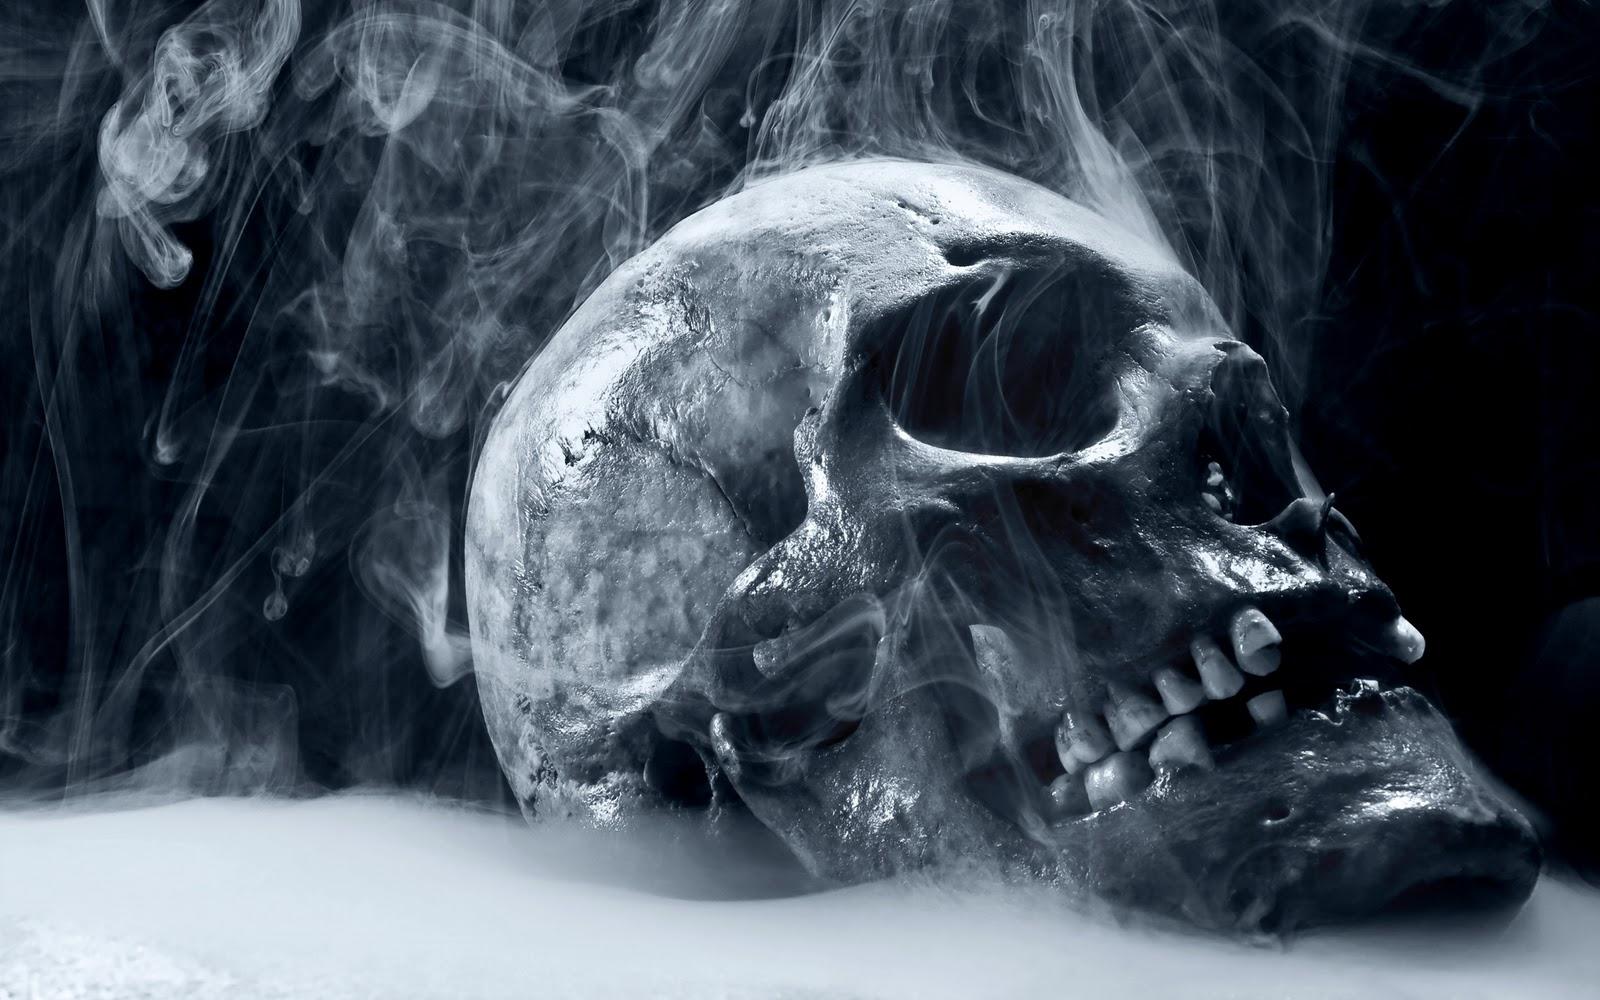 Archive Miscellaneous Skull smoking skull horror hd wallpaperjpg 1600x1000